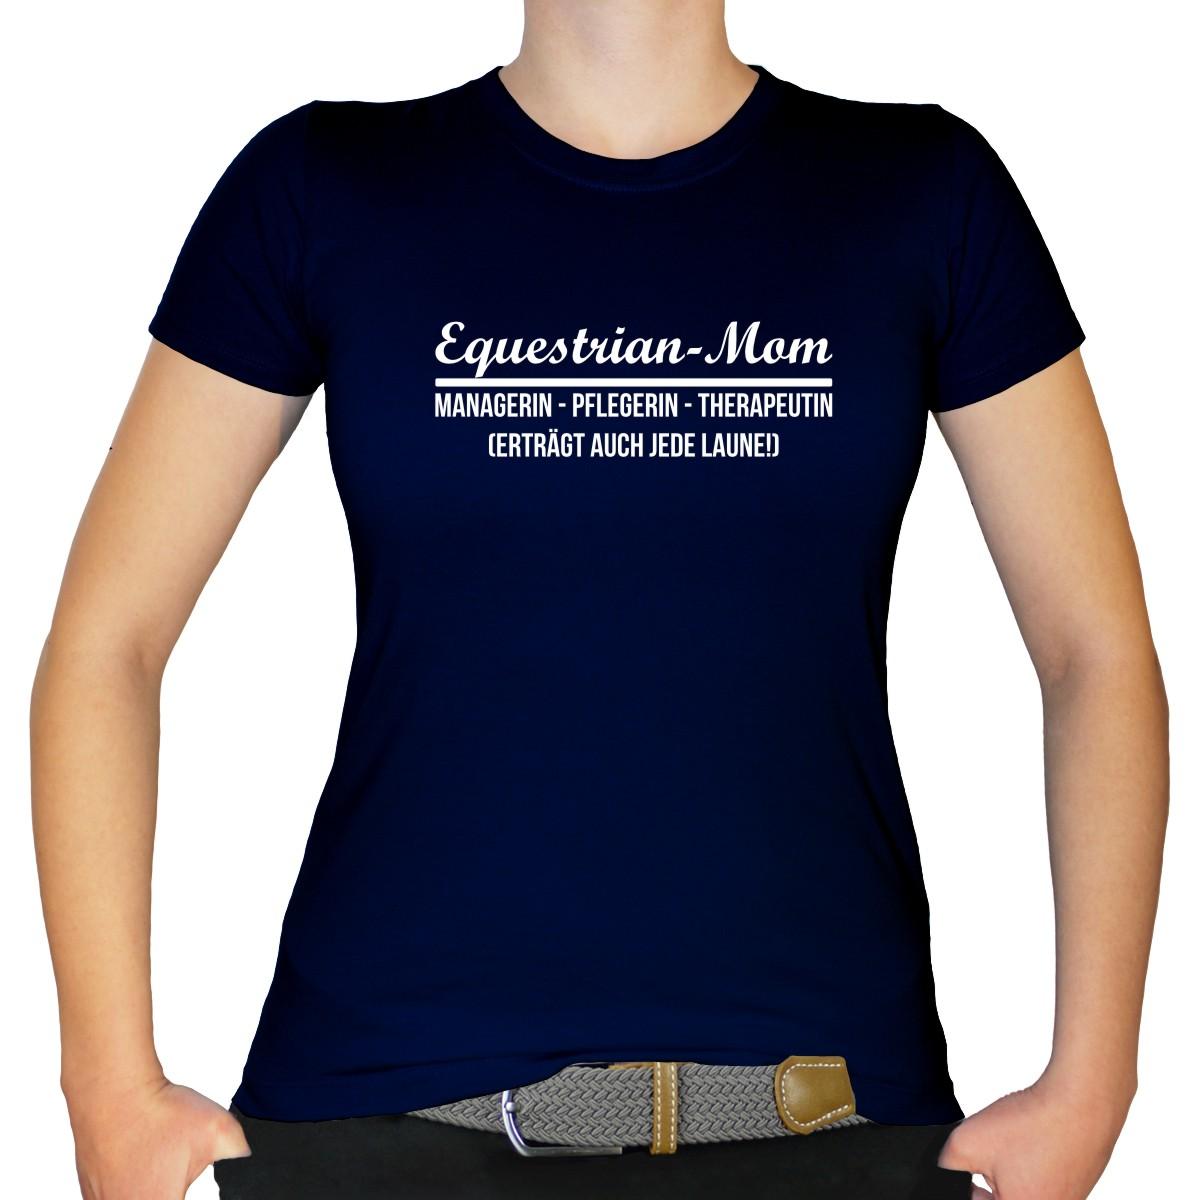 CAVALIMA Statement T-Shirt EQUESTRIAN MOM